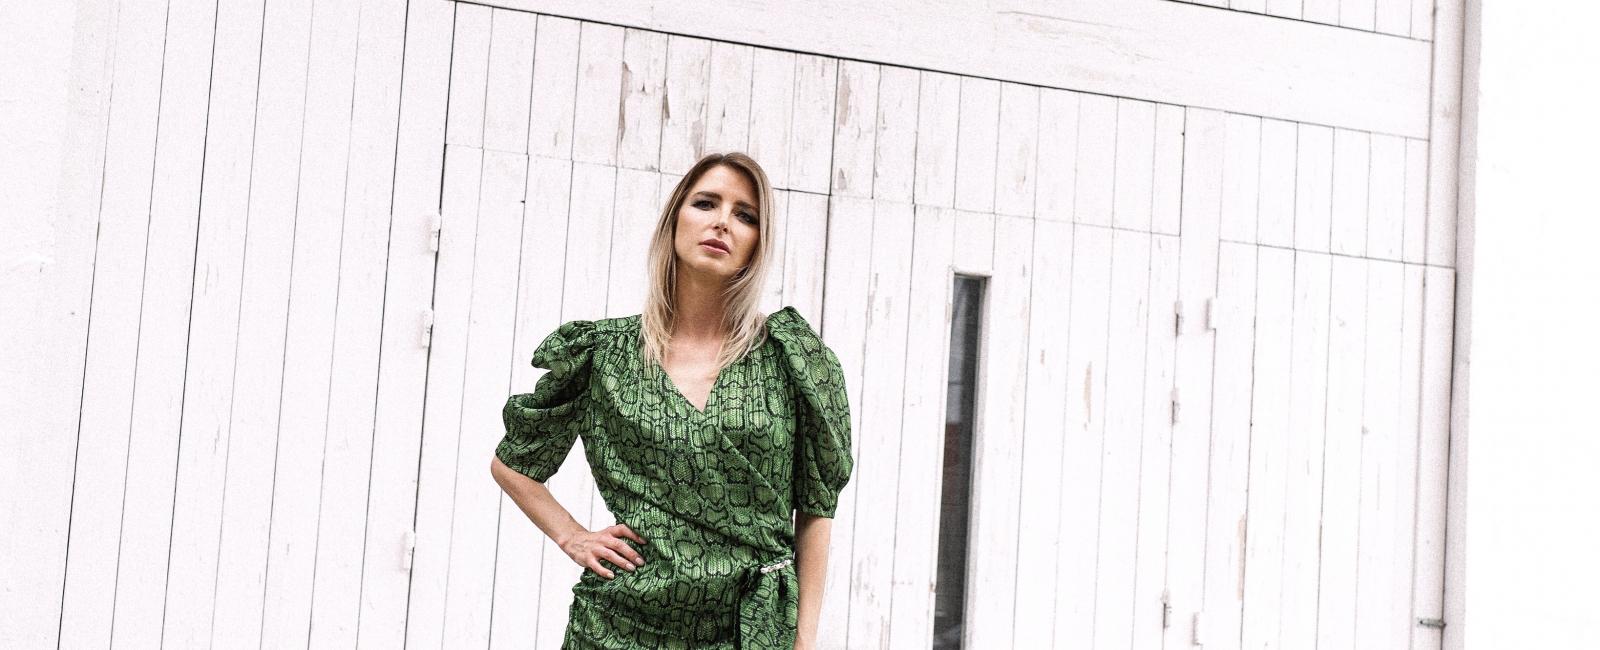 MOD-by-Monique-Fashion-Looks-Eat-Your-Greens-Birgitte-Herskind-Copenhagen